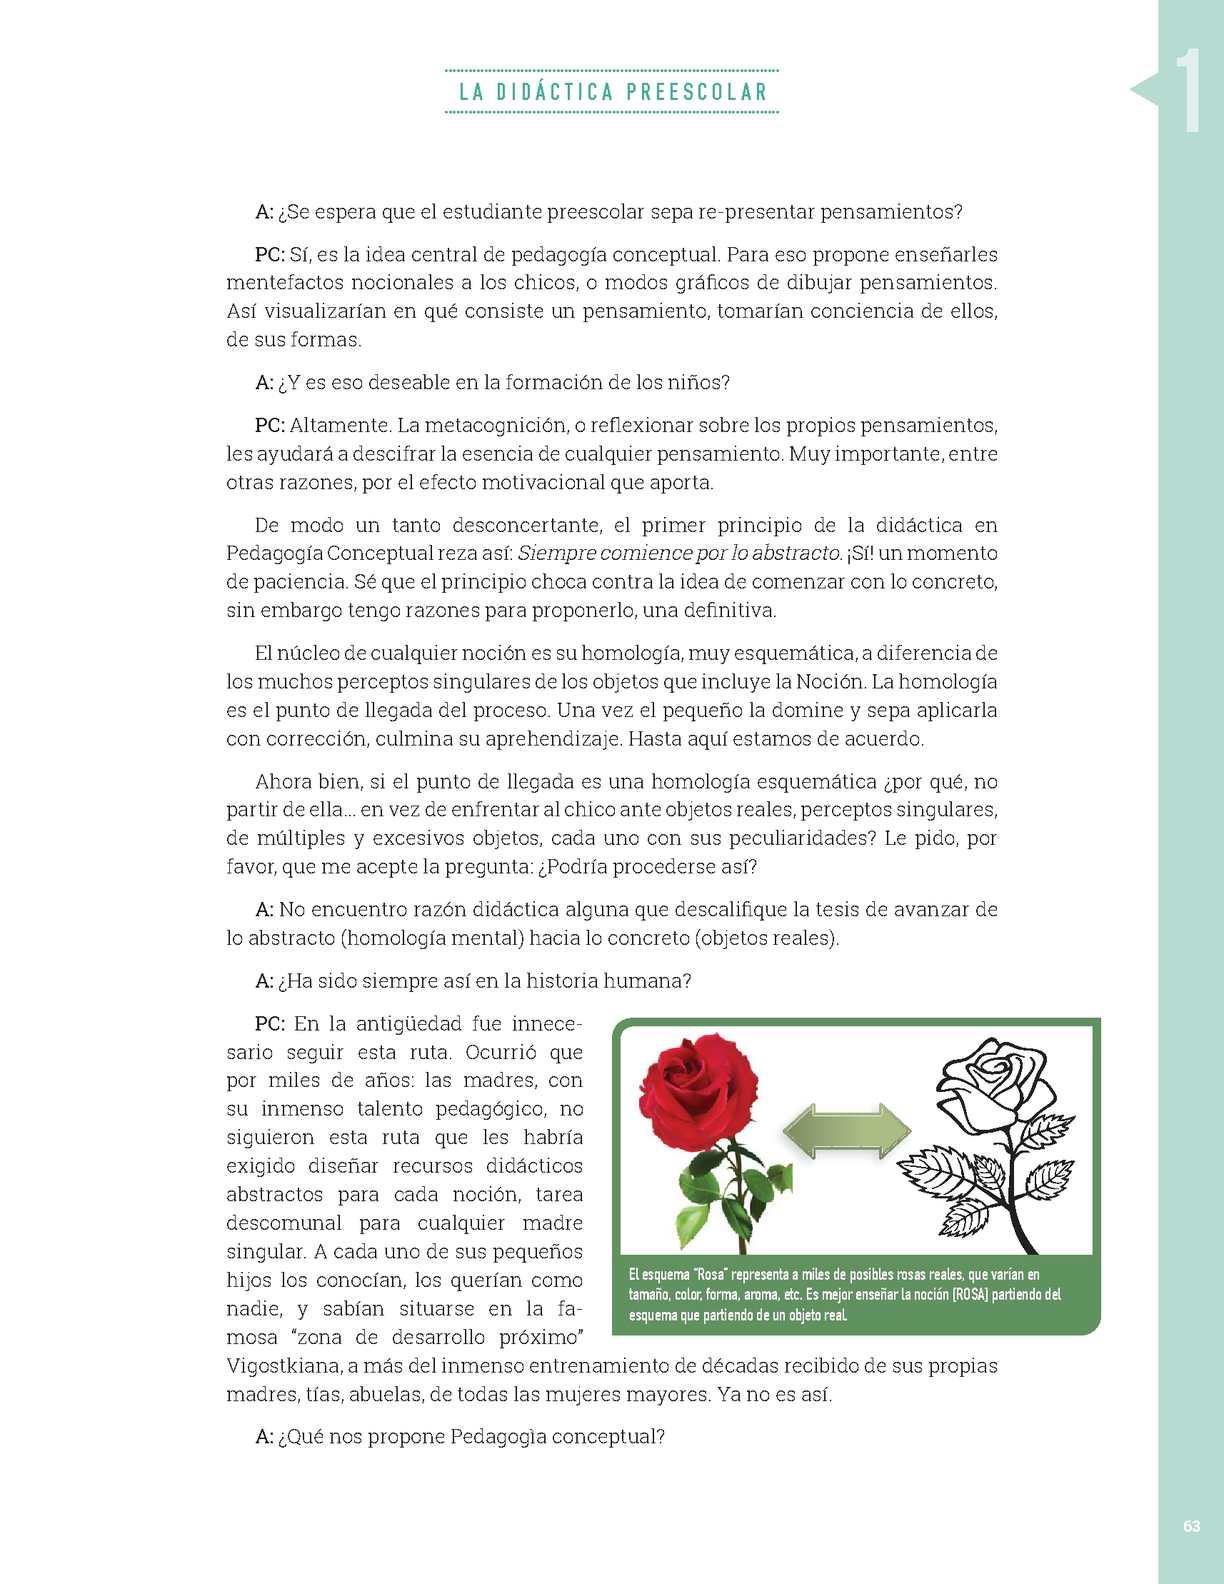 Didacticas Conceptuales Mod1 Calameo Downloader